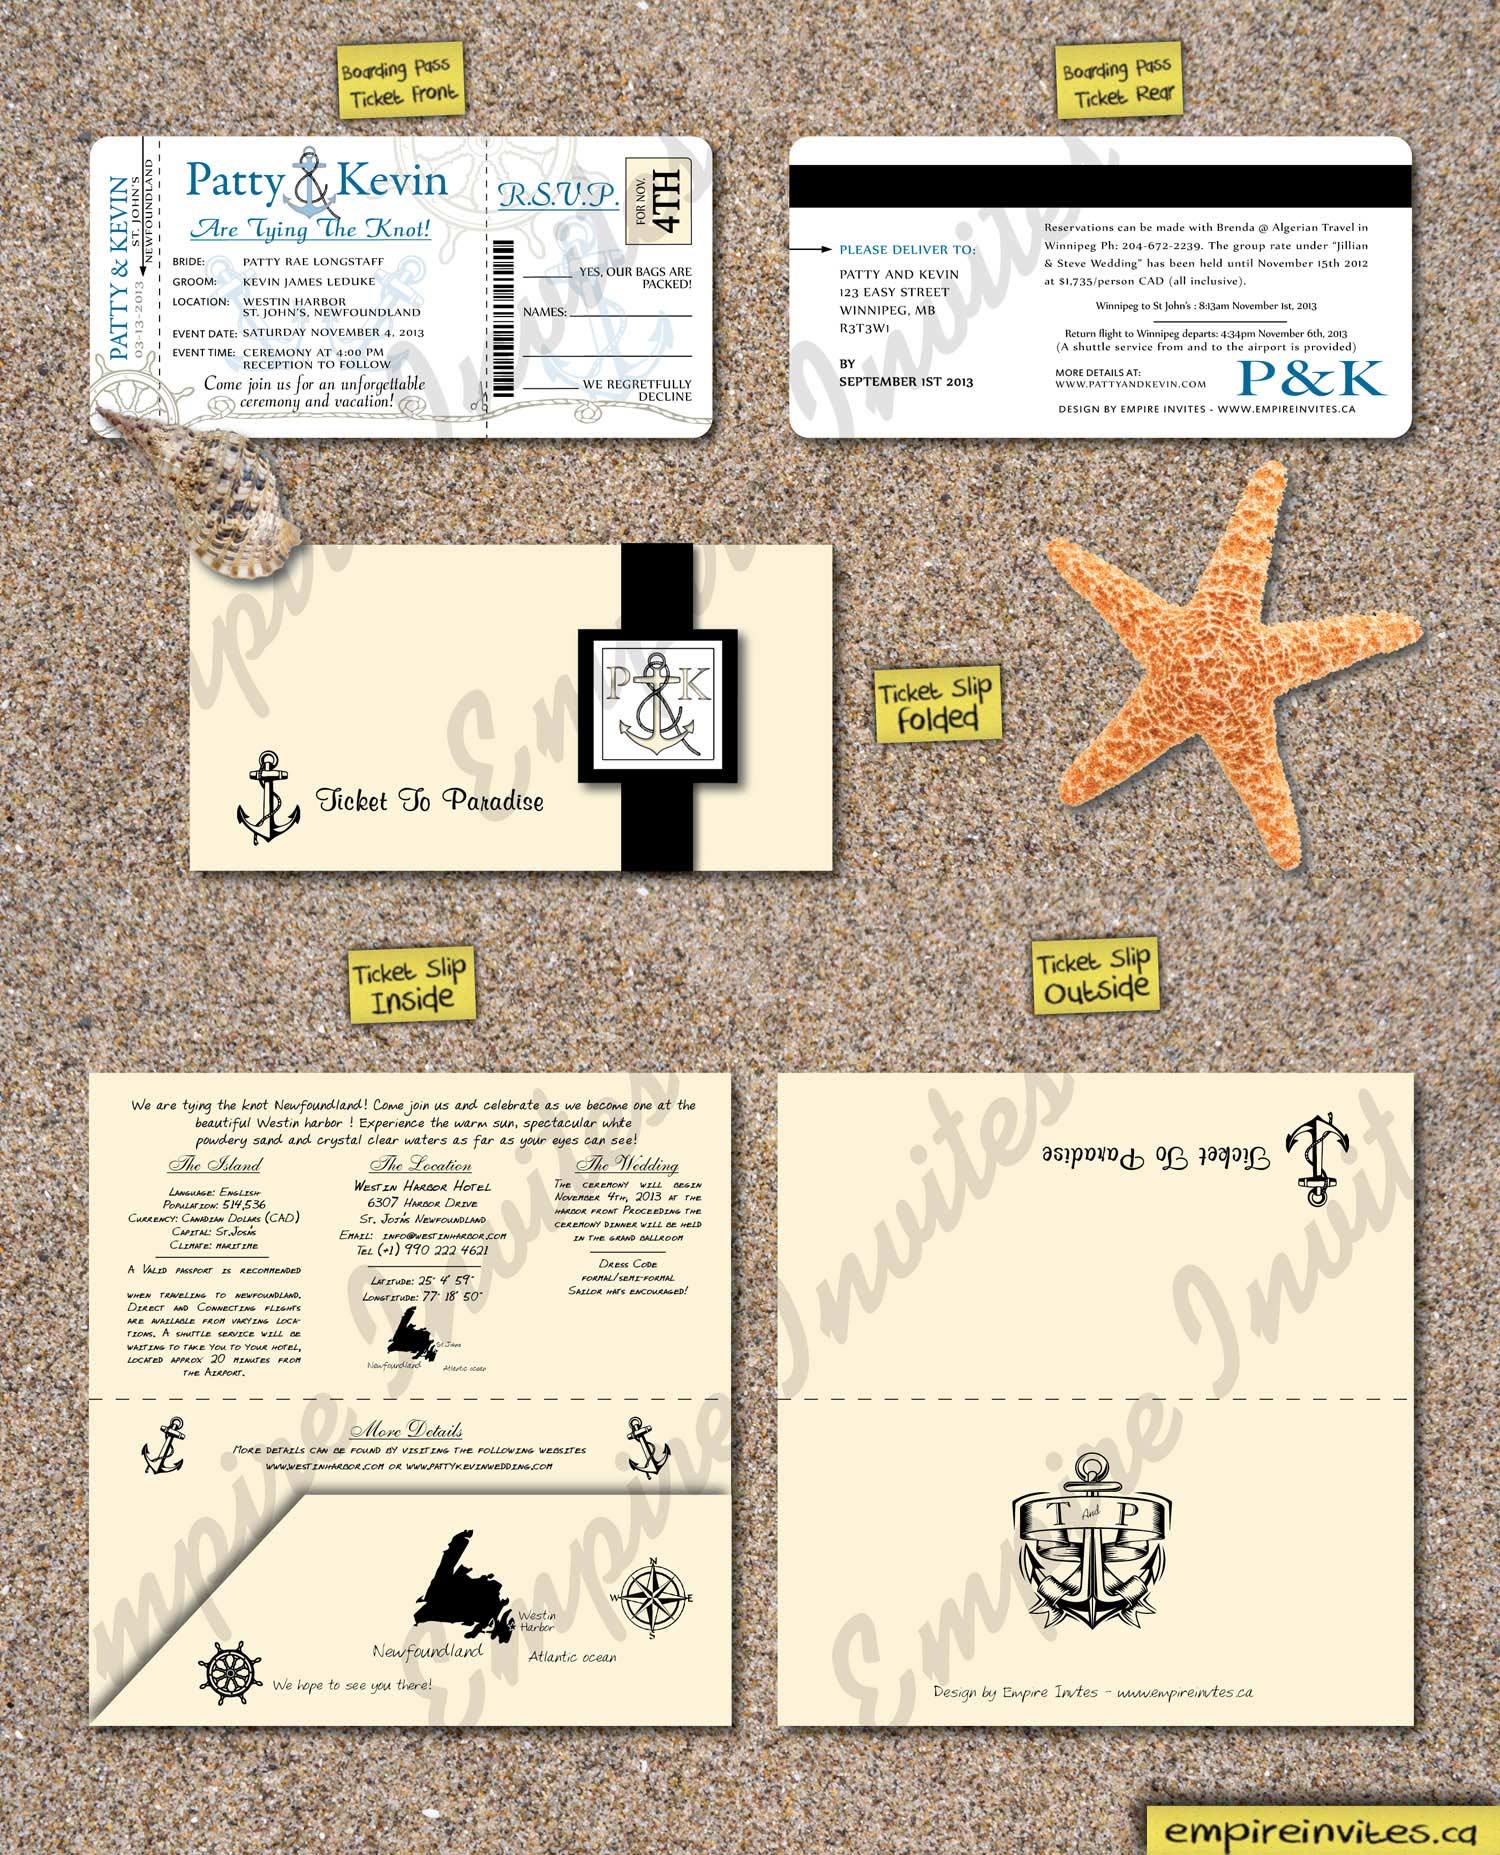 Custom Nautical boarding pass wedding invitations Canada | Empire ...